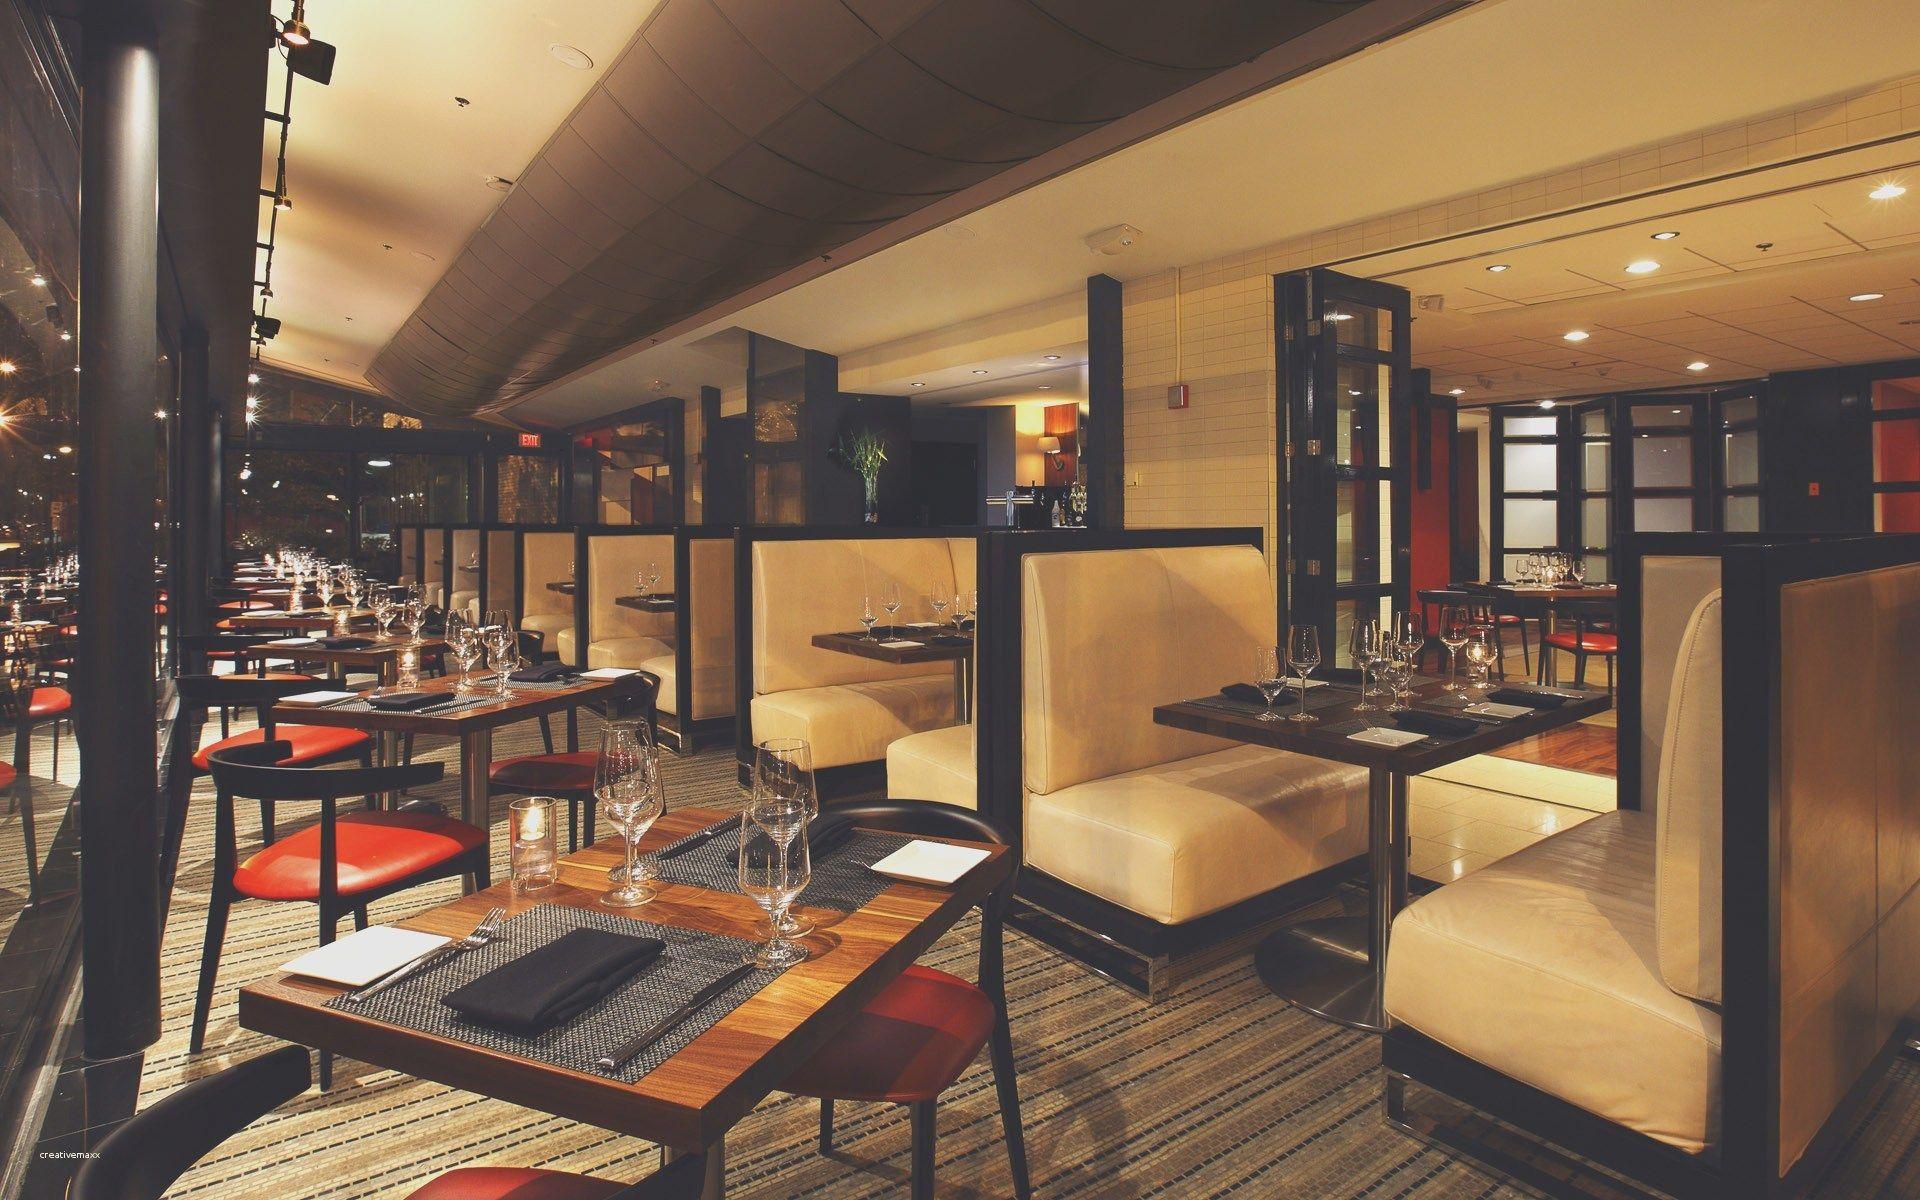 Lovely Mexican Restaurant Decor Interior Design | Mexican restaurant ...